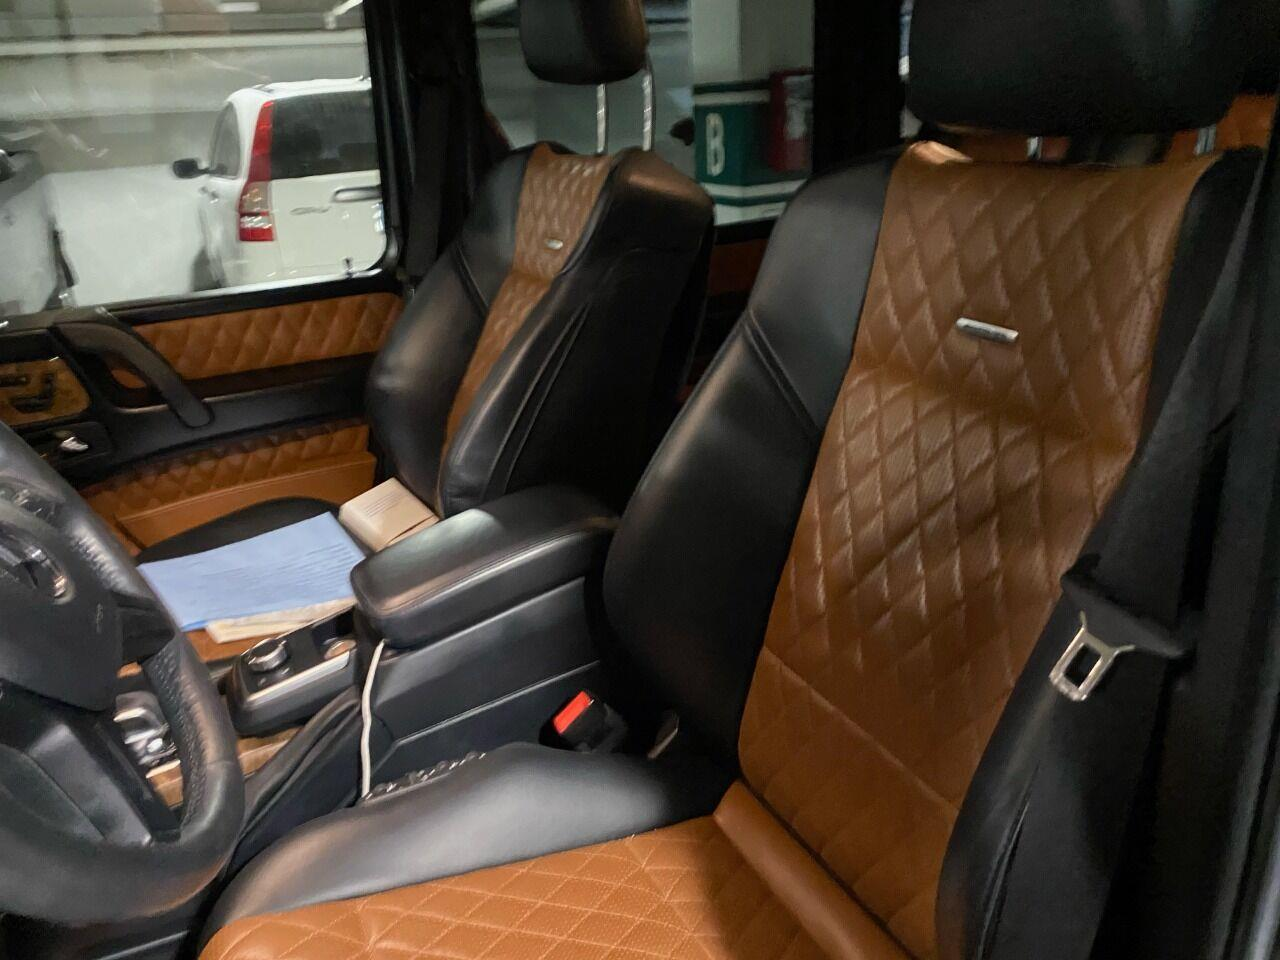 2018 Mercedes-Benz G-Class (CC-1415195) for sale in San Diego, California